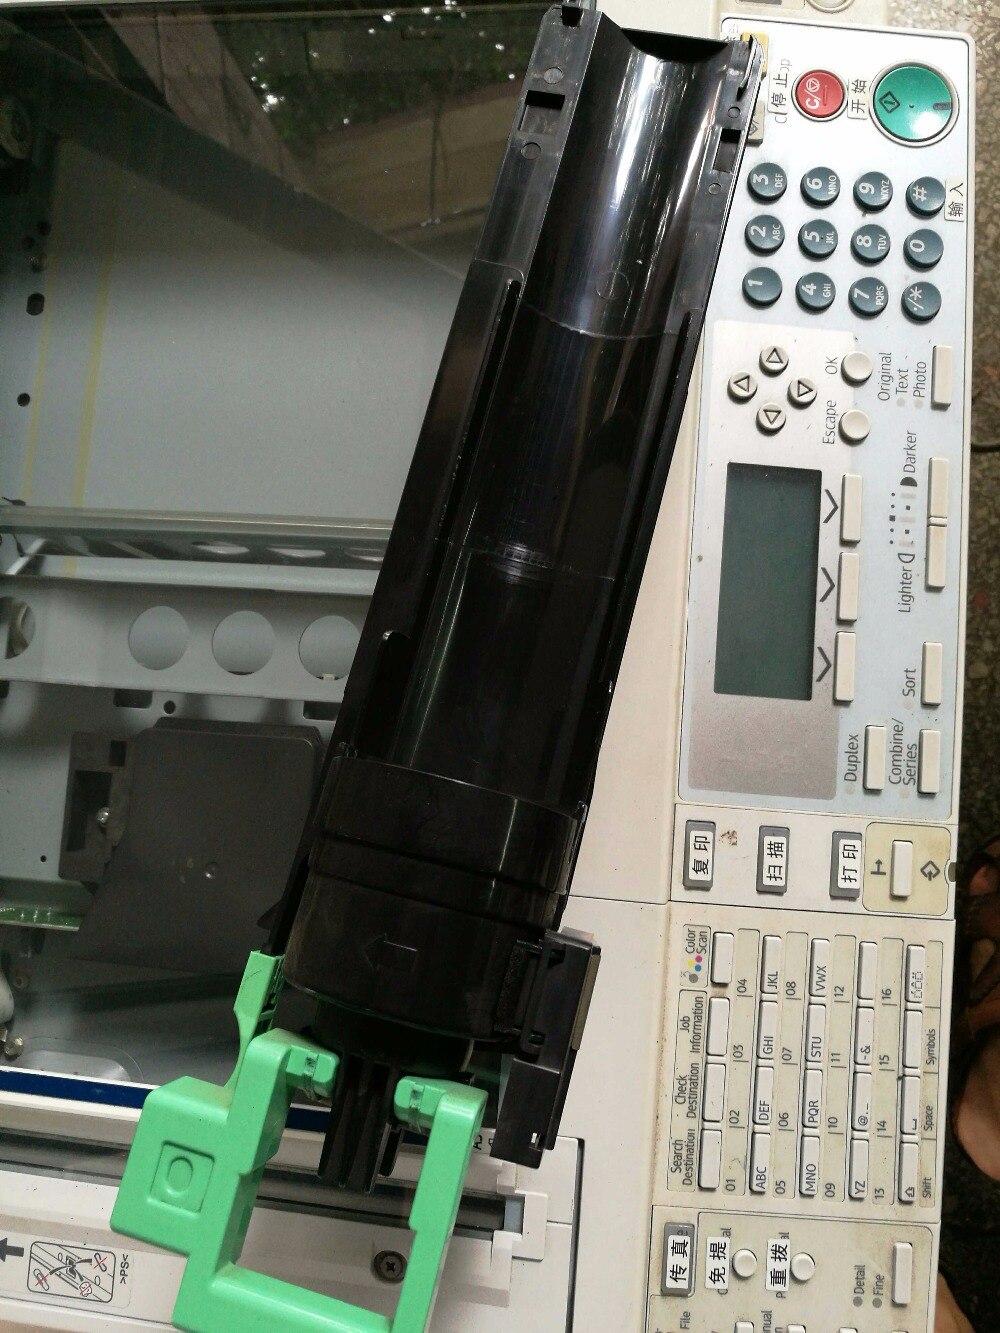 refubish B044 3470 Toner Hopper Supply Unit For Ricoh Aficio 1013 1515 Mp161 Mp175 DSM 415